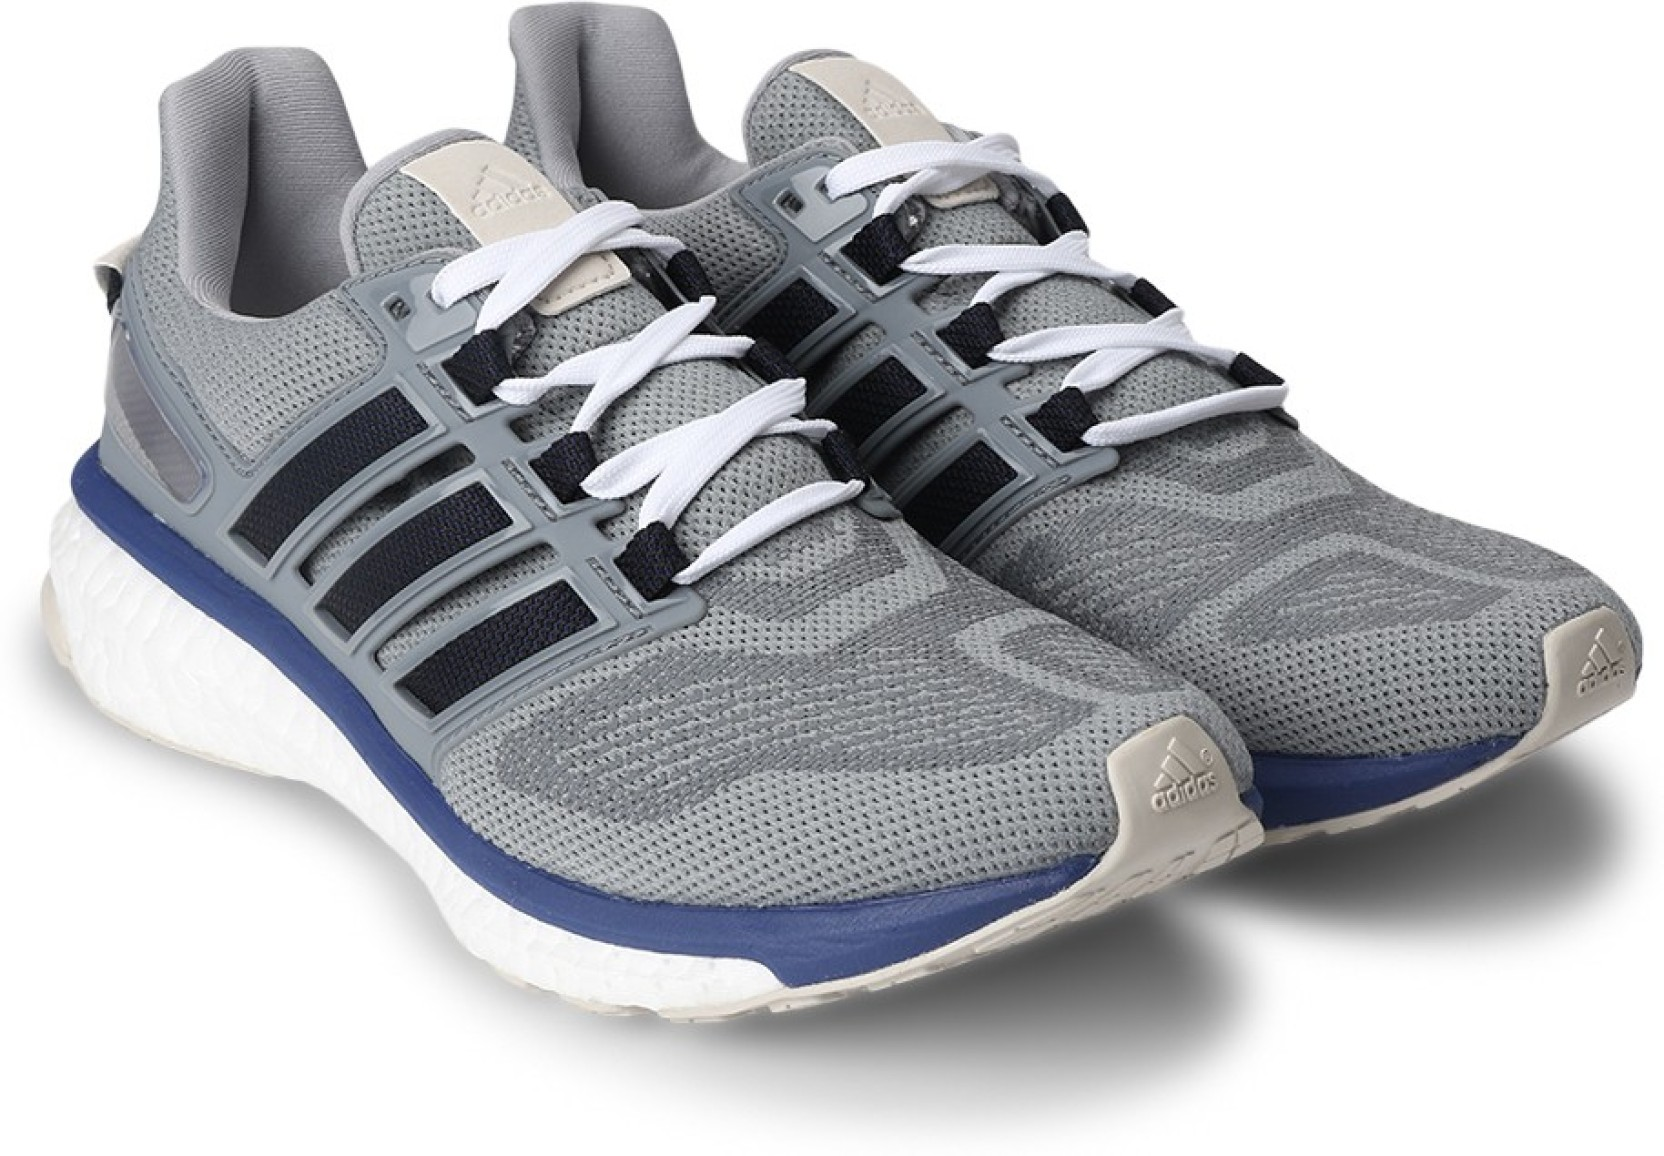 b255c73d7 ADIDAS ENERGY BOOST 3 M Running Shoes For Men - Buy MIDGRE UNIINK ...